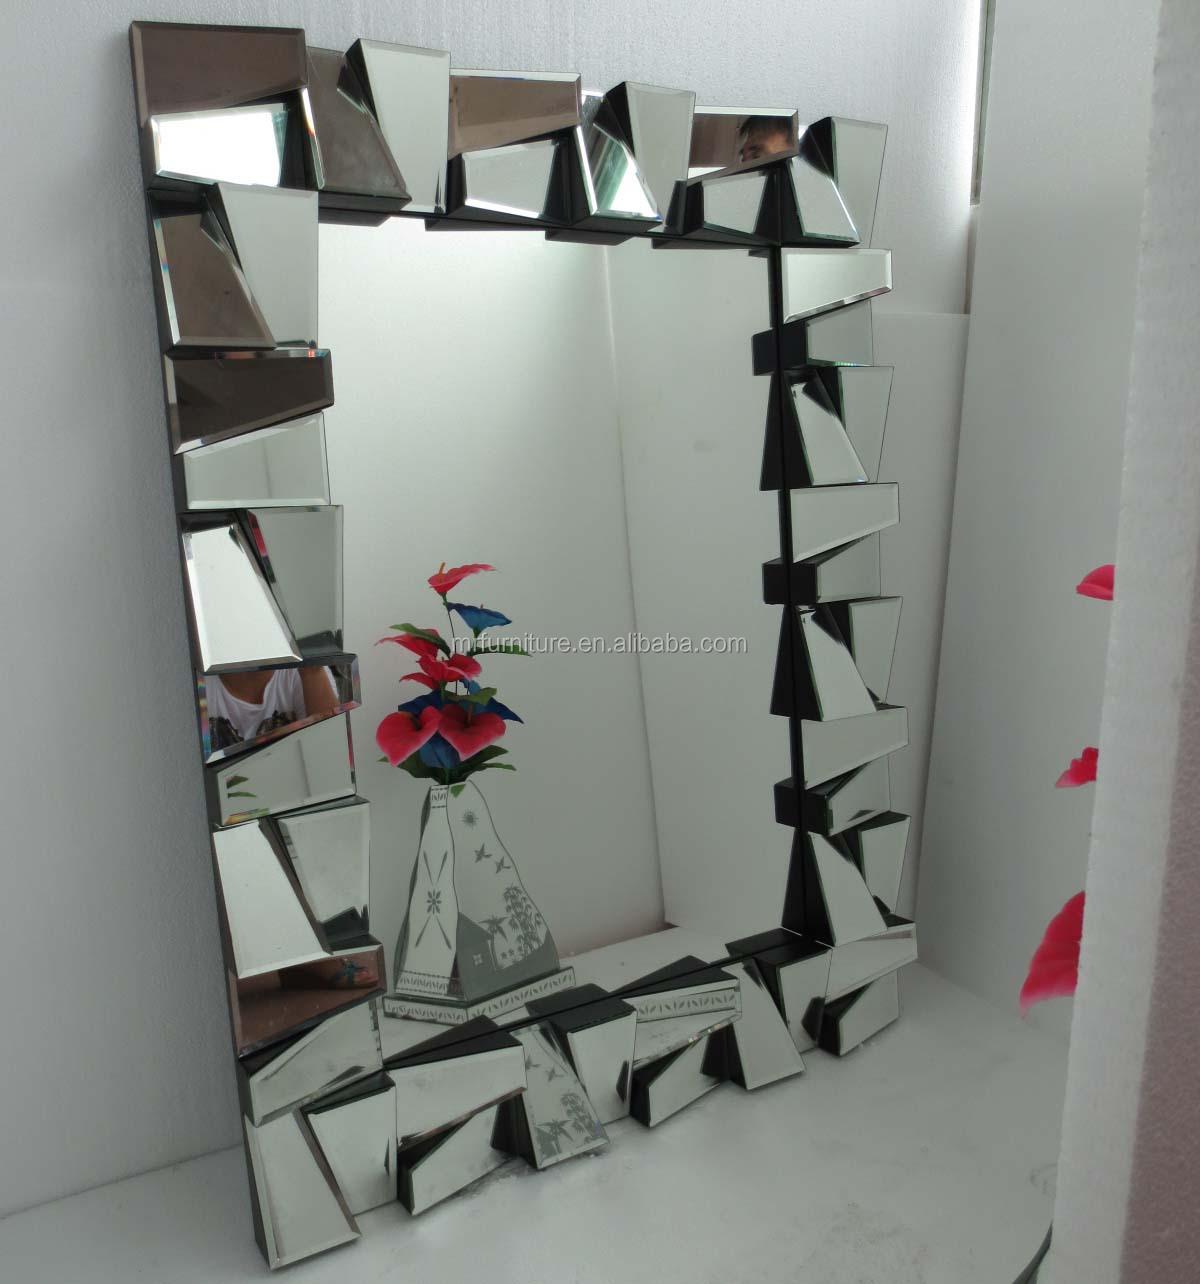 Big facet miroir mural pour salle manger buy product for Miroir mural a coller